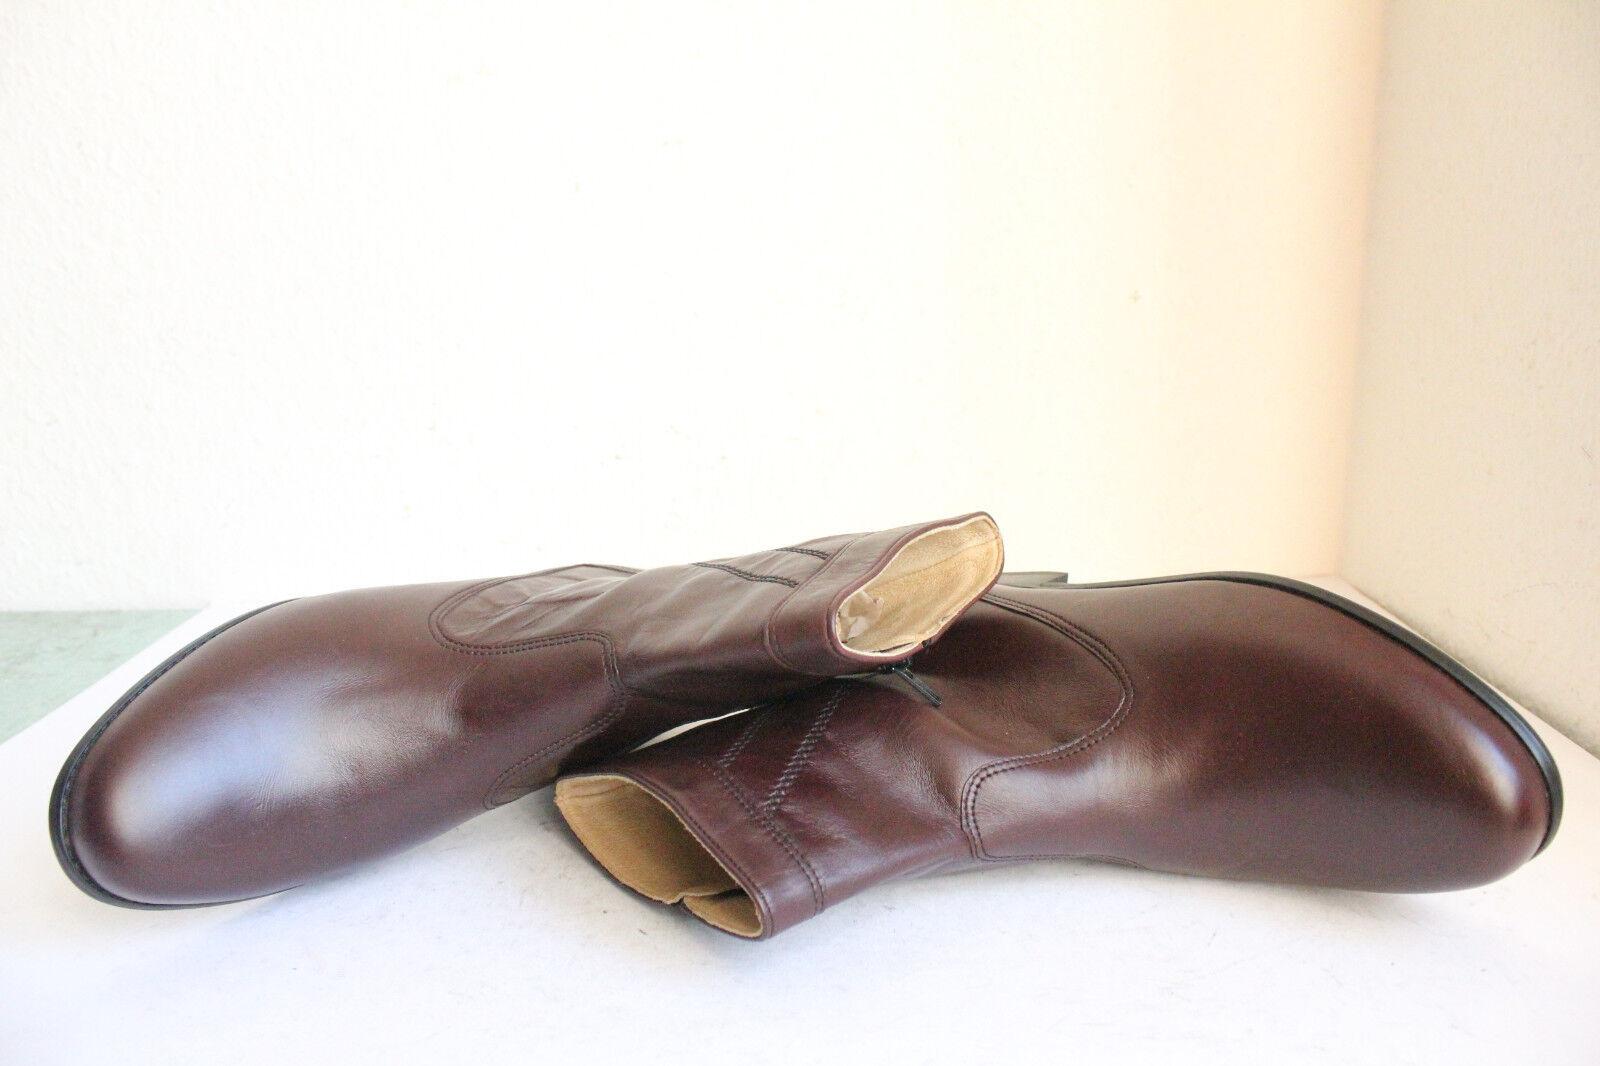 Salamander Elegante Classic Echtleder Stiefeletten Stiefel Echtleder Classic Weinrot Eu:40,5-Wie Neu 4bef5a